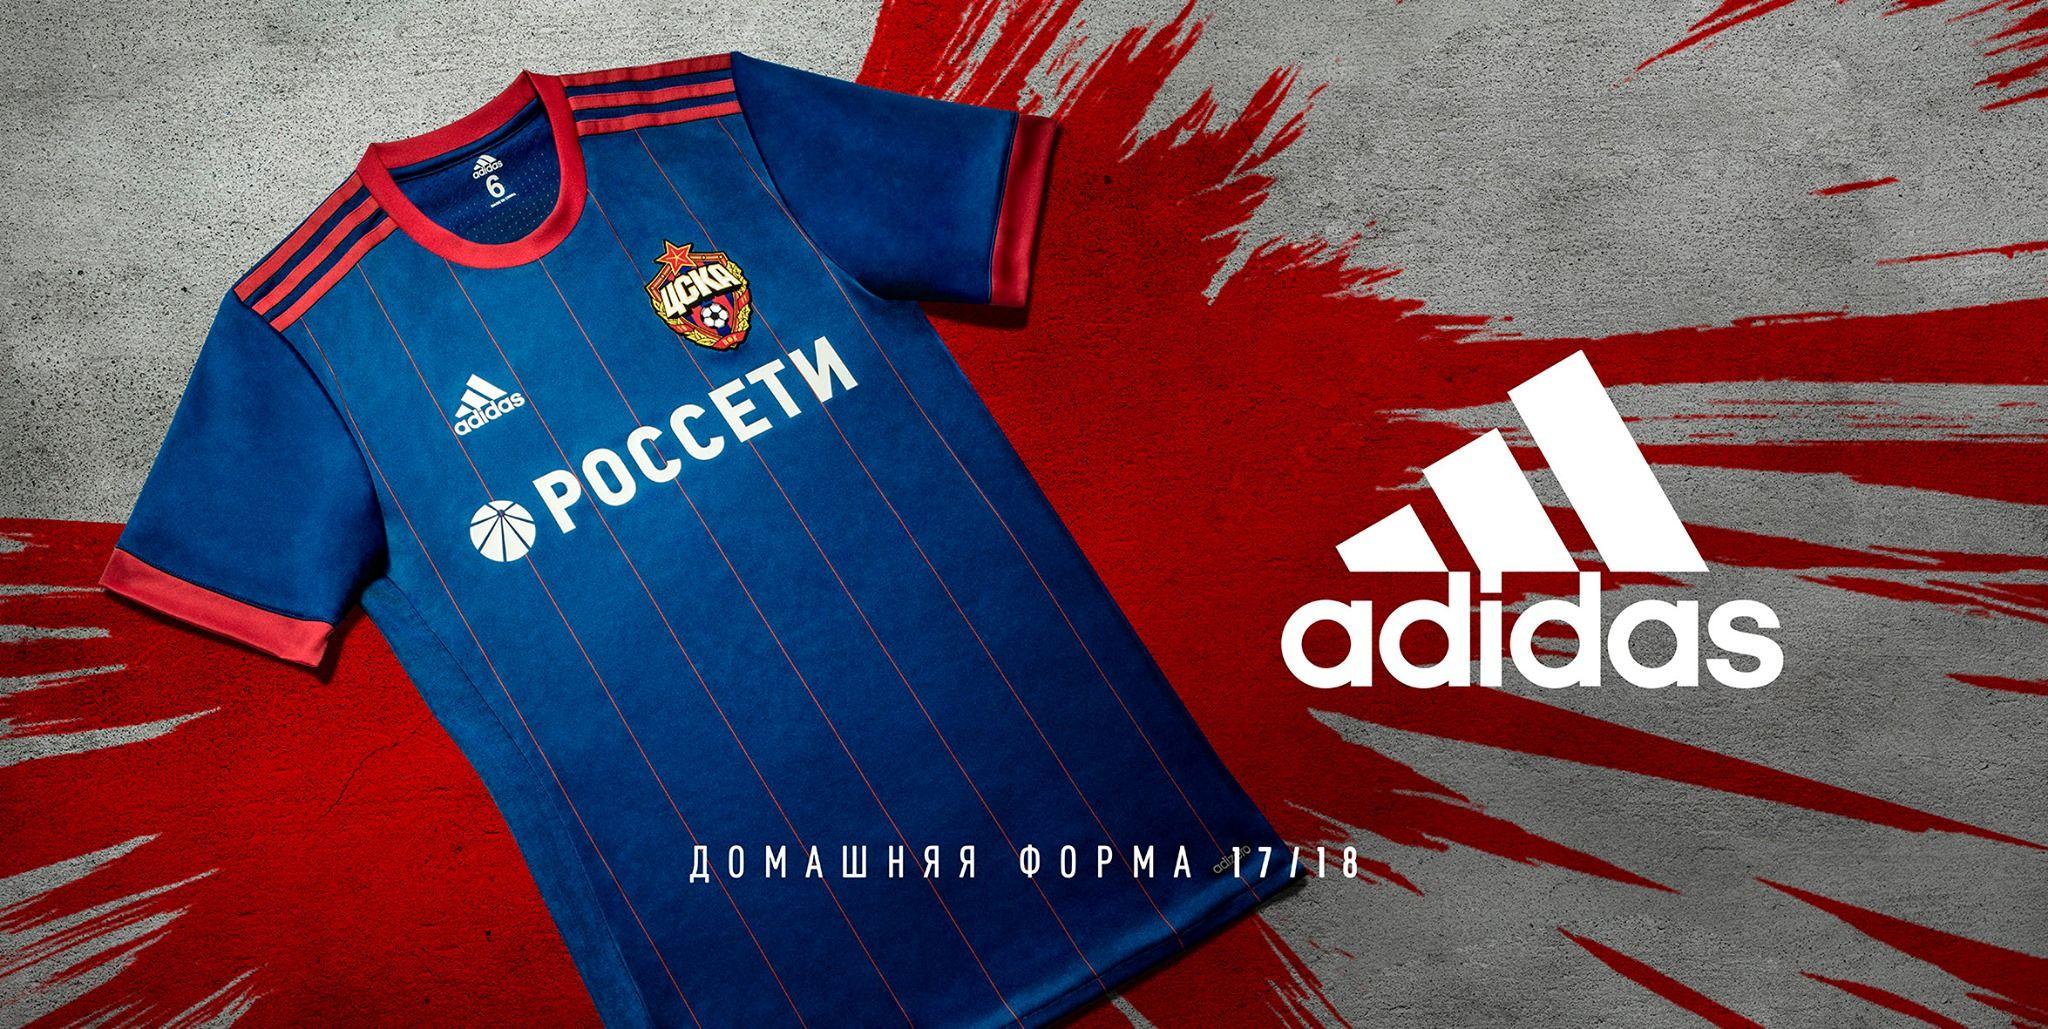 CSKA Moscow 2017-18 Adidas Home Kit  75d1ec9b5